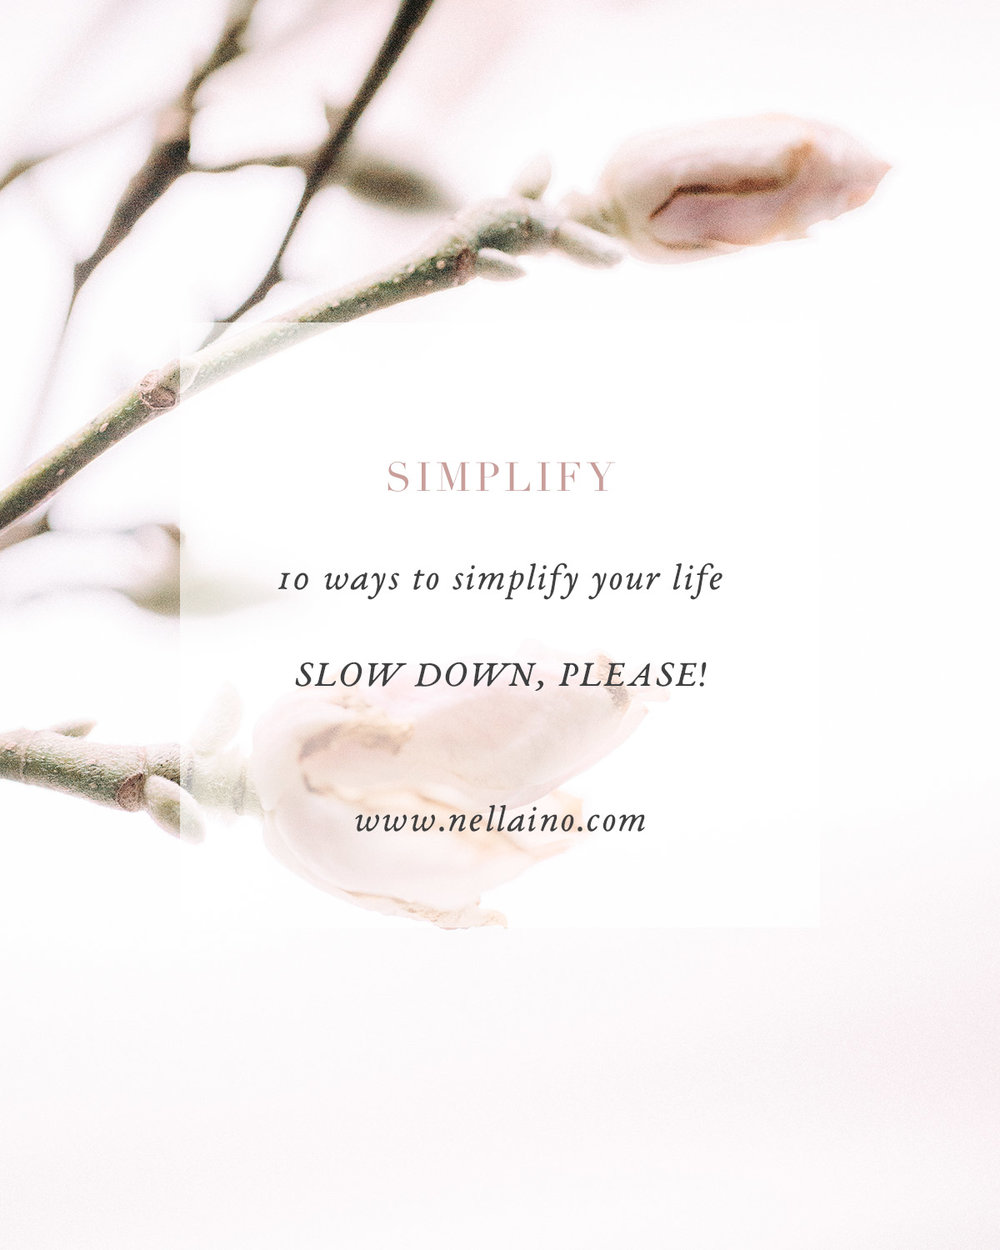 Simplify-your-life-1.jpg